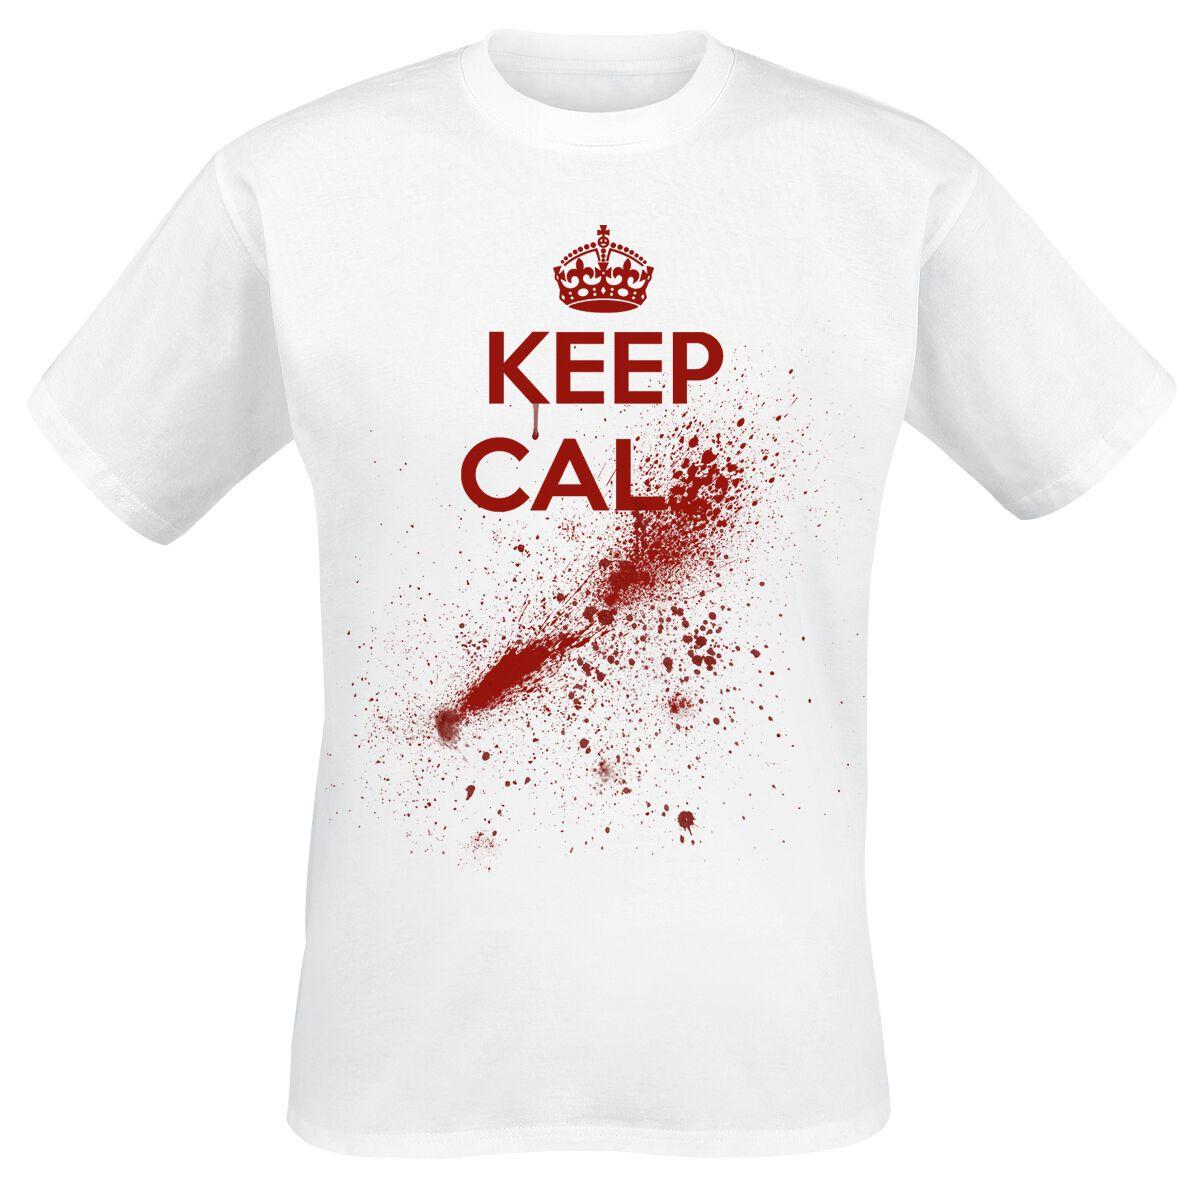 Fun Shirts - Koszulki - T-Shirt Bloody Keep Calm T-Shirt biały - 365896